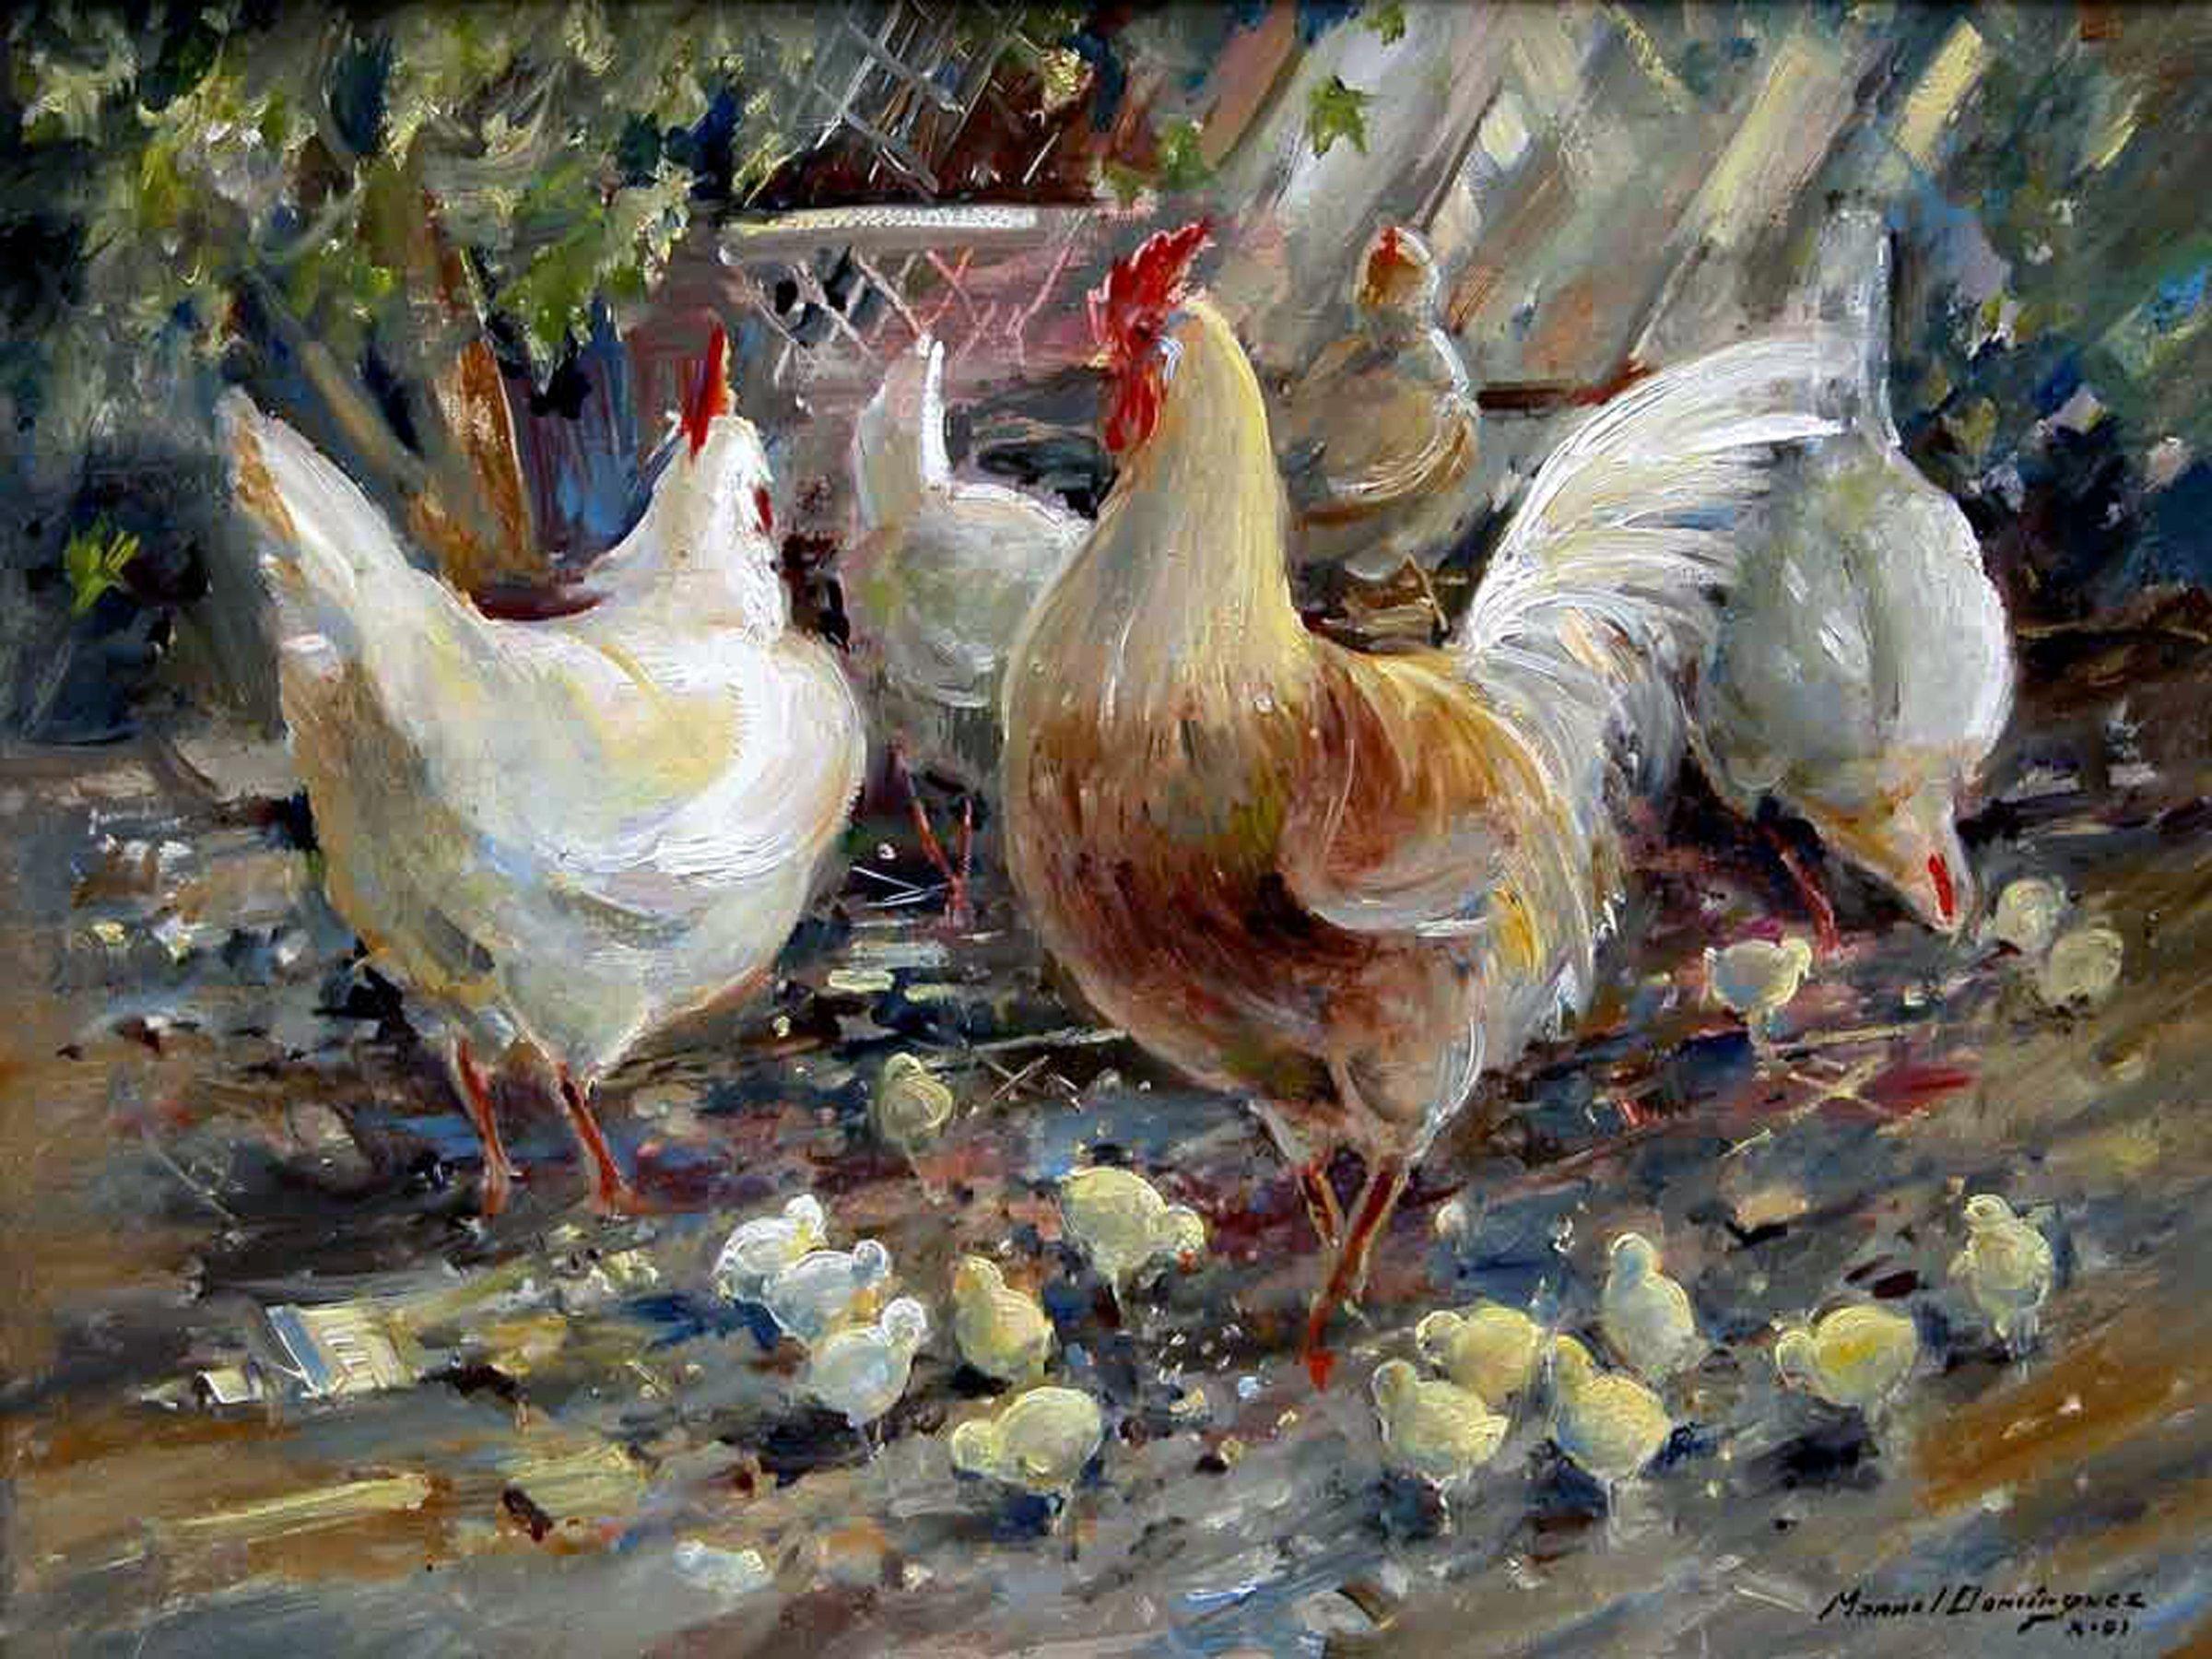 Rooster and hens by Manuel Dominguez Accent Tile Mural Kitchen Bathroom Wall Backsplash Behind Stove Range Sink Splashback One Tile 8''x6'' Ceramic, Glossy by FlekmanArt